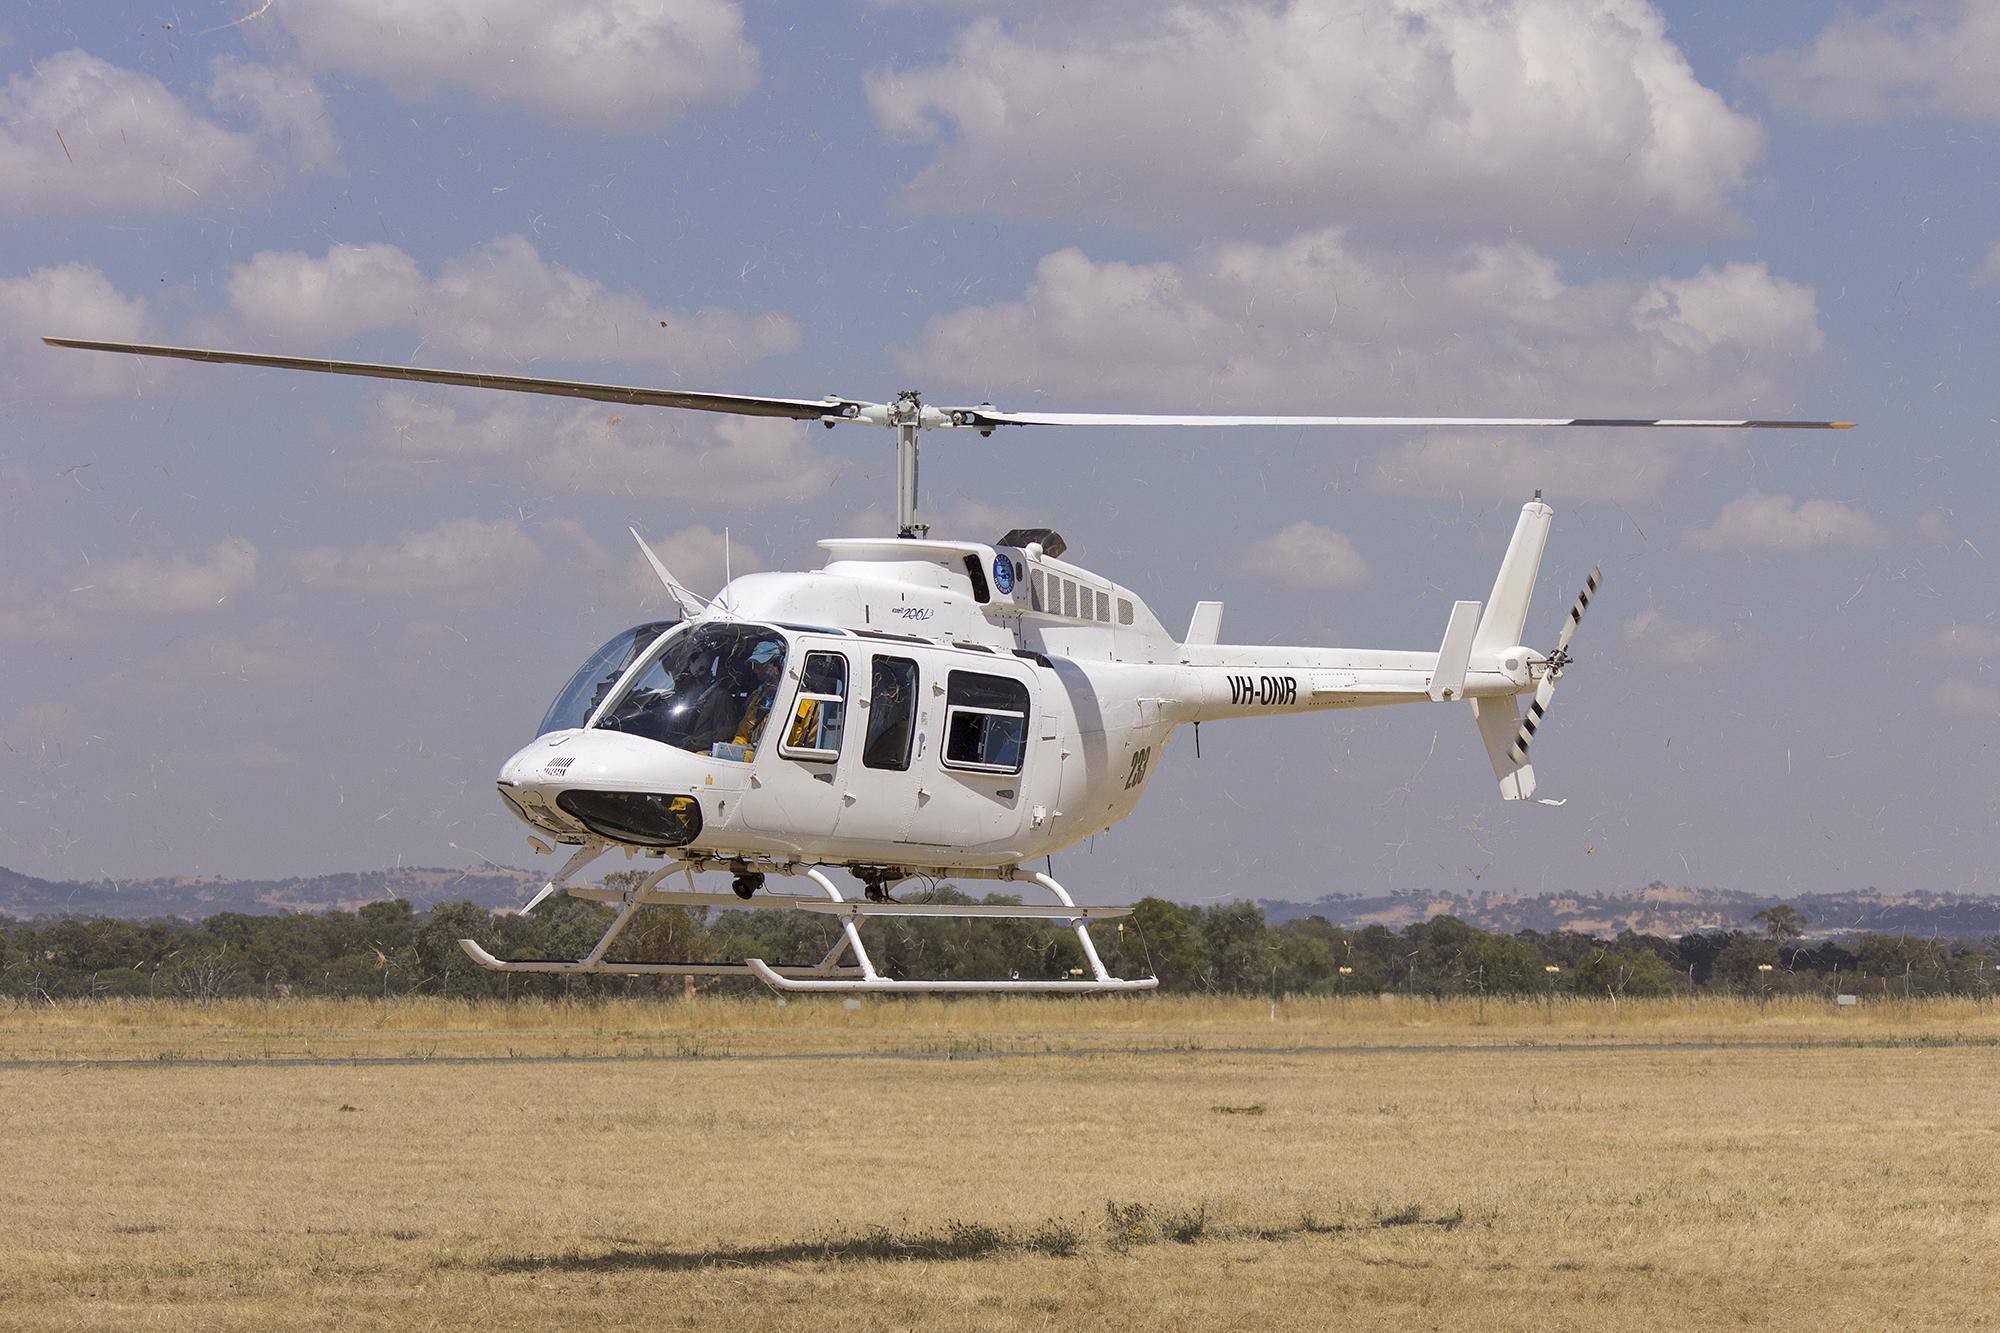 File:MI Helicopters (VH-ONR) Bell 206L-3 LongRanger III arriving